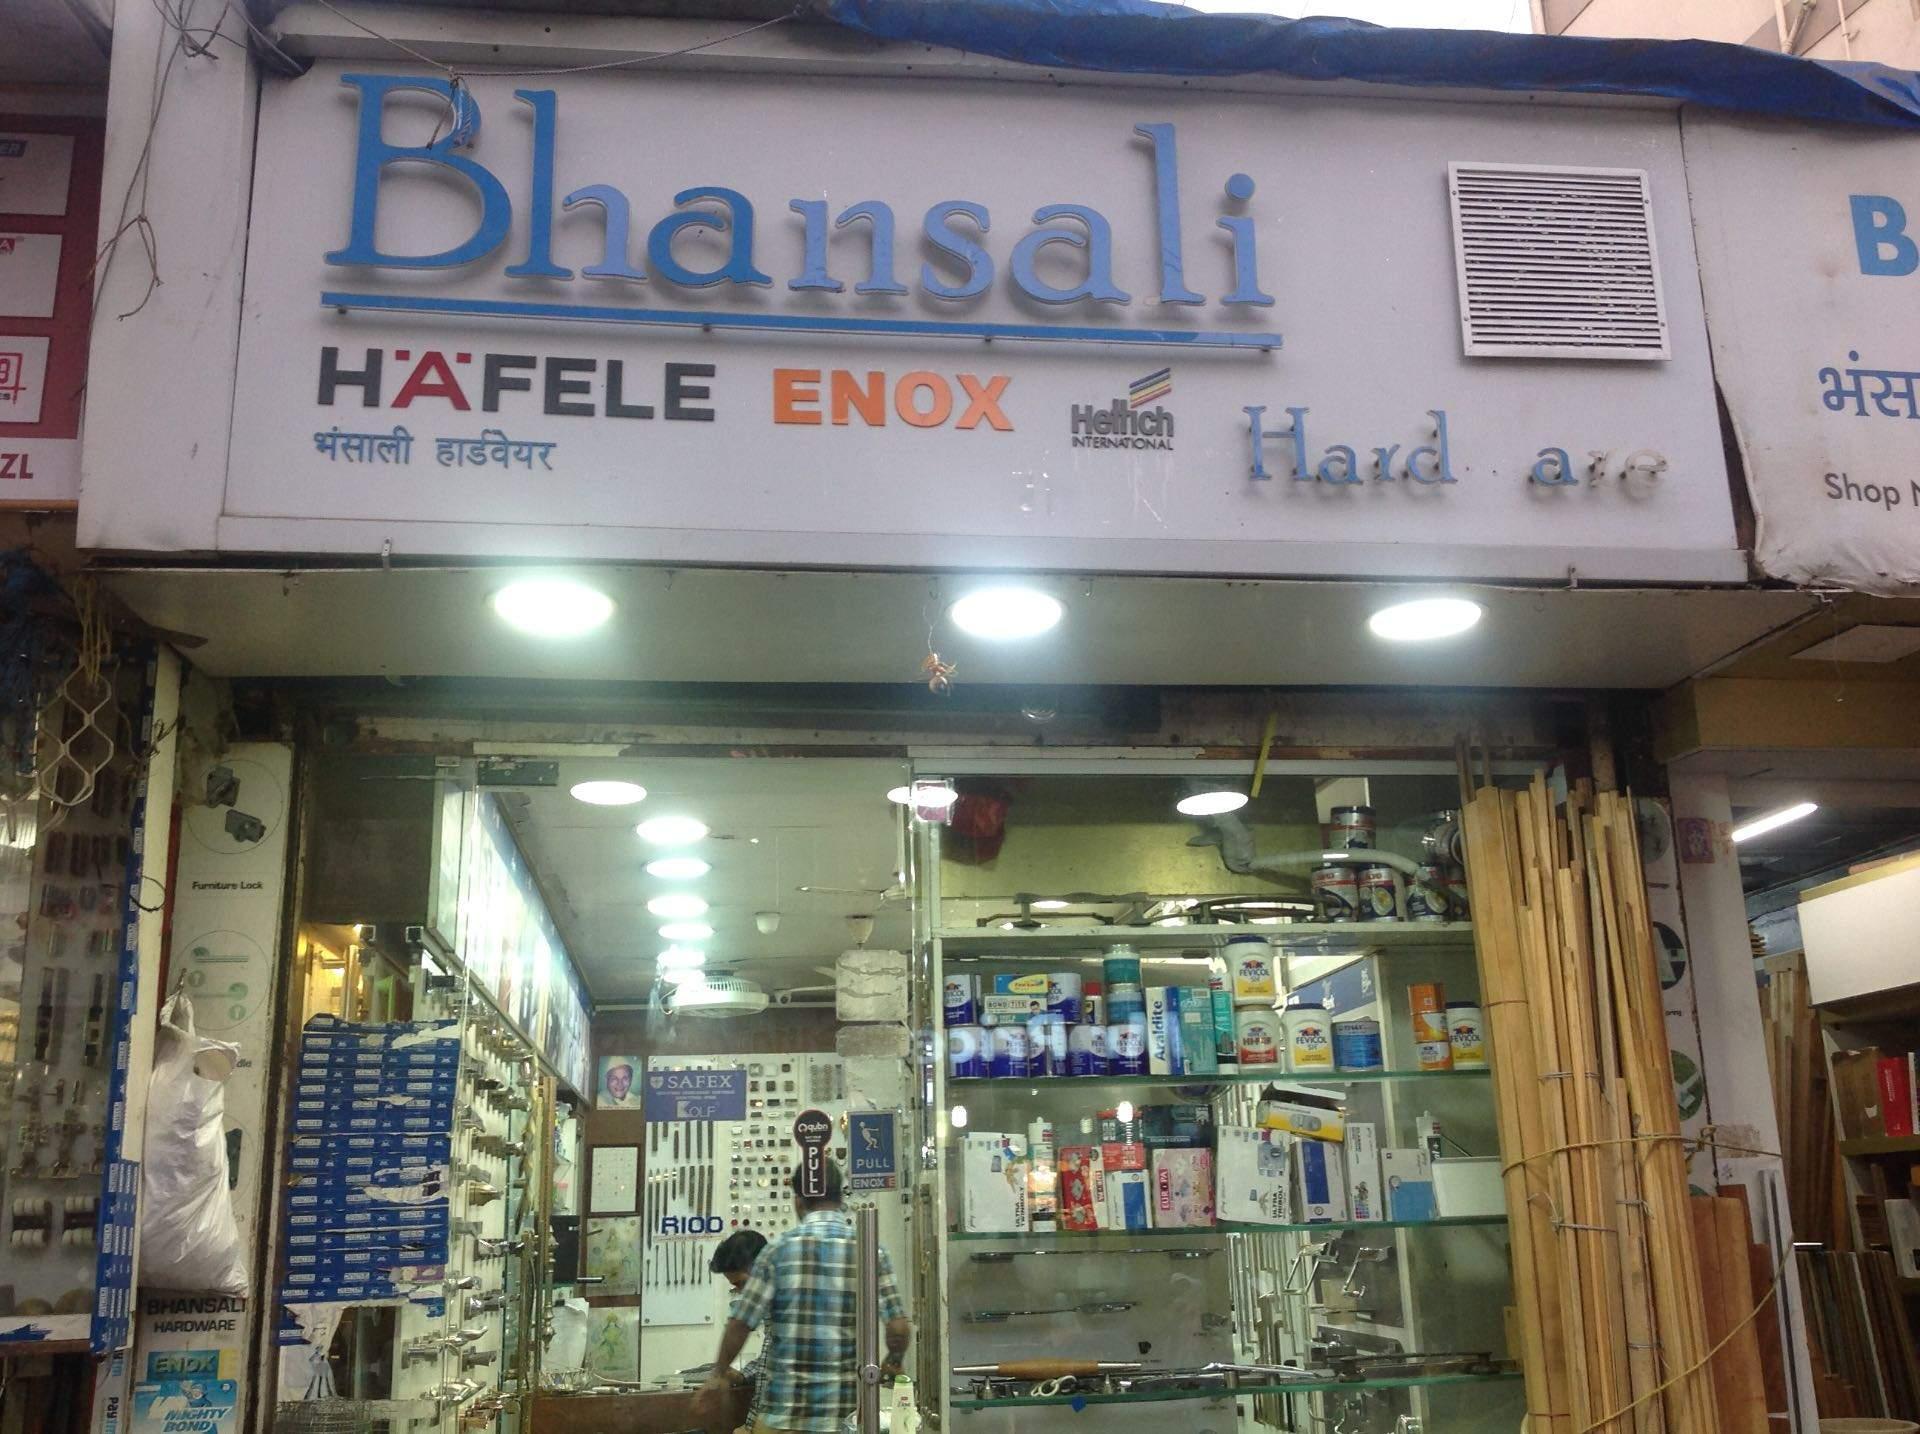 Top 10 Hardware Shops in Colaba - Best Hardware Stores Mumbai - Justdial